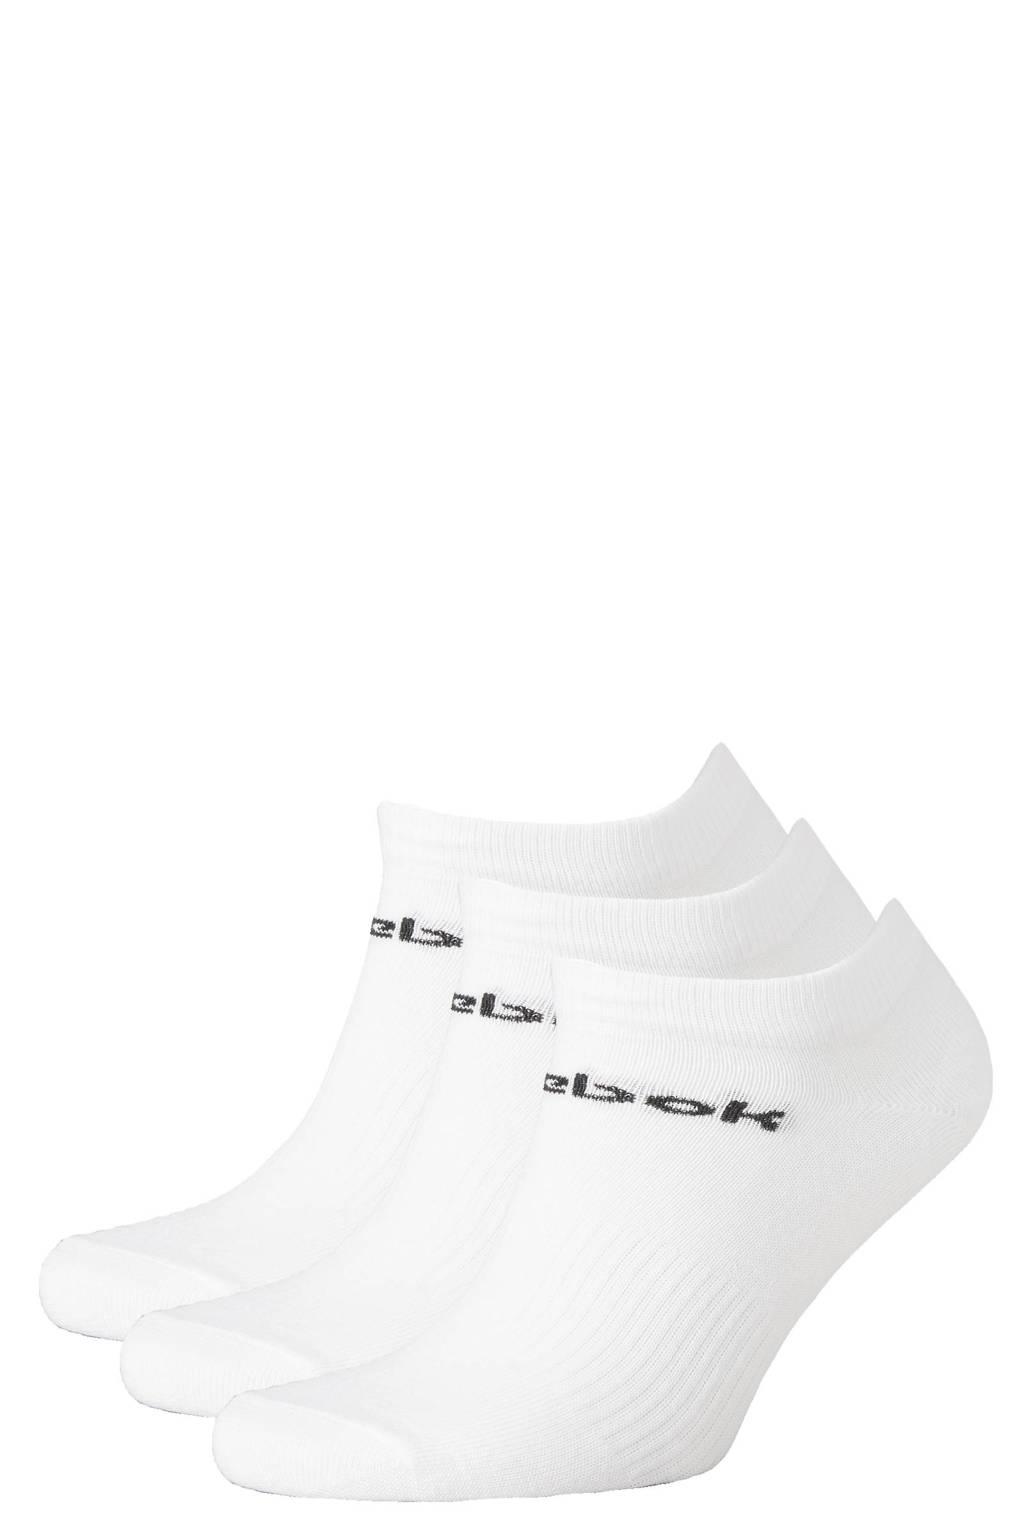 Reebok Training sneakersokken -  set van 3 wit, Wit